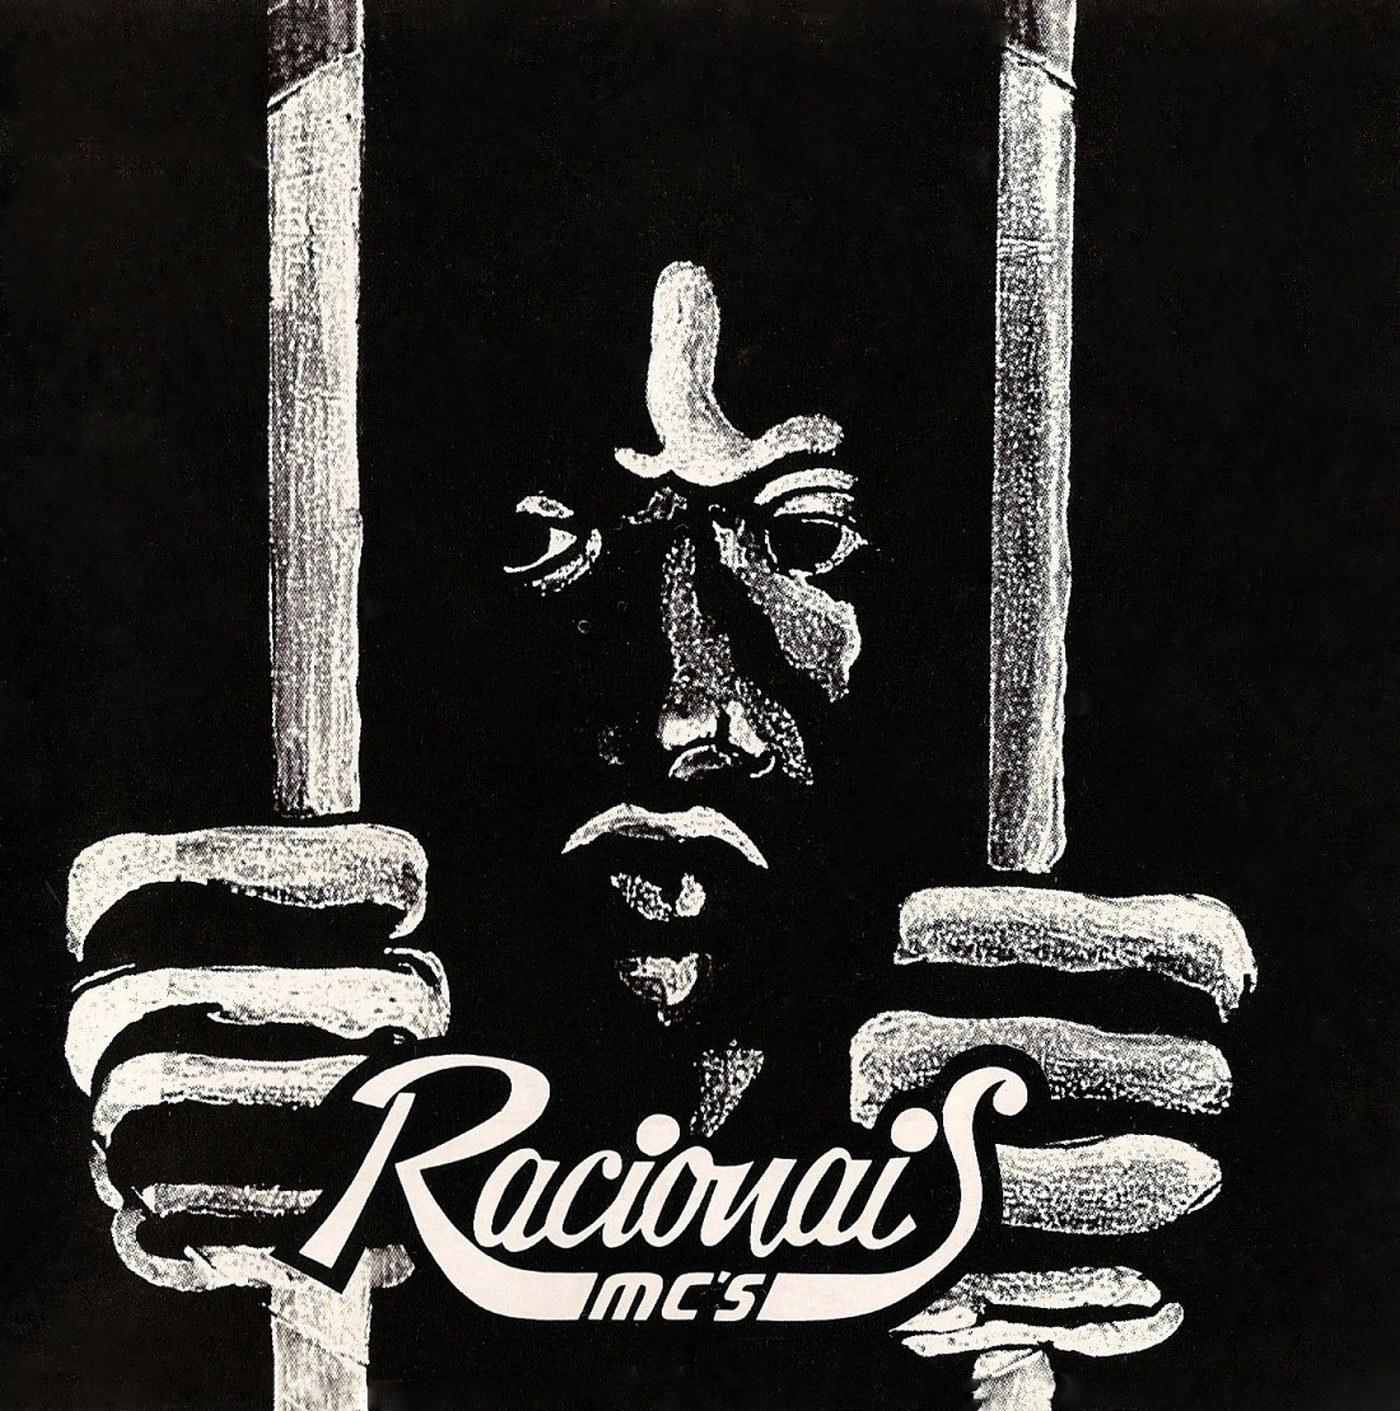 Capa da Coletânea Racionais MC's 1994